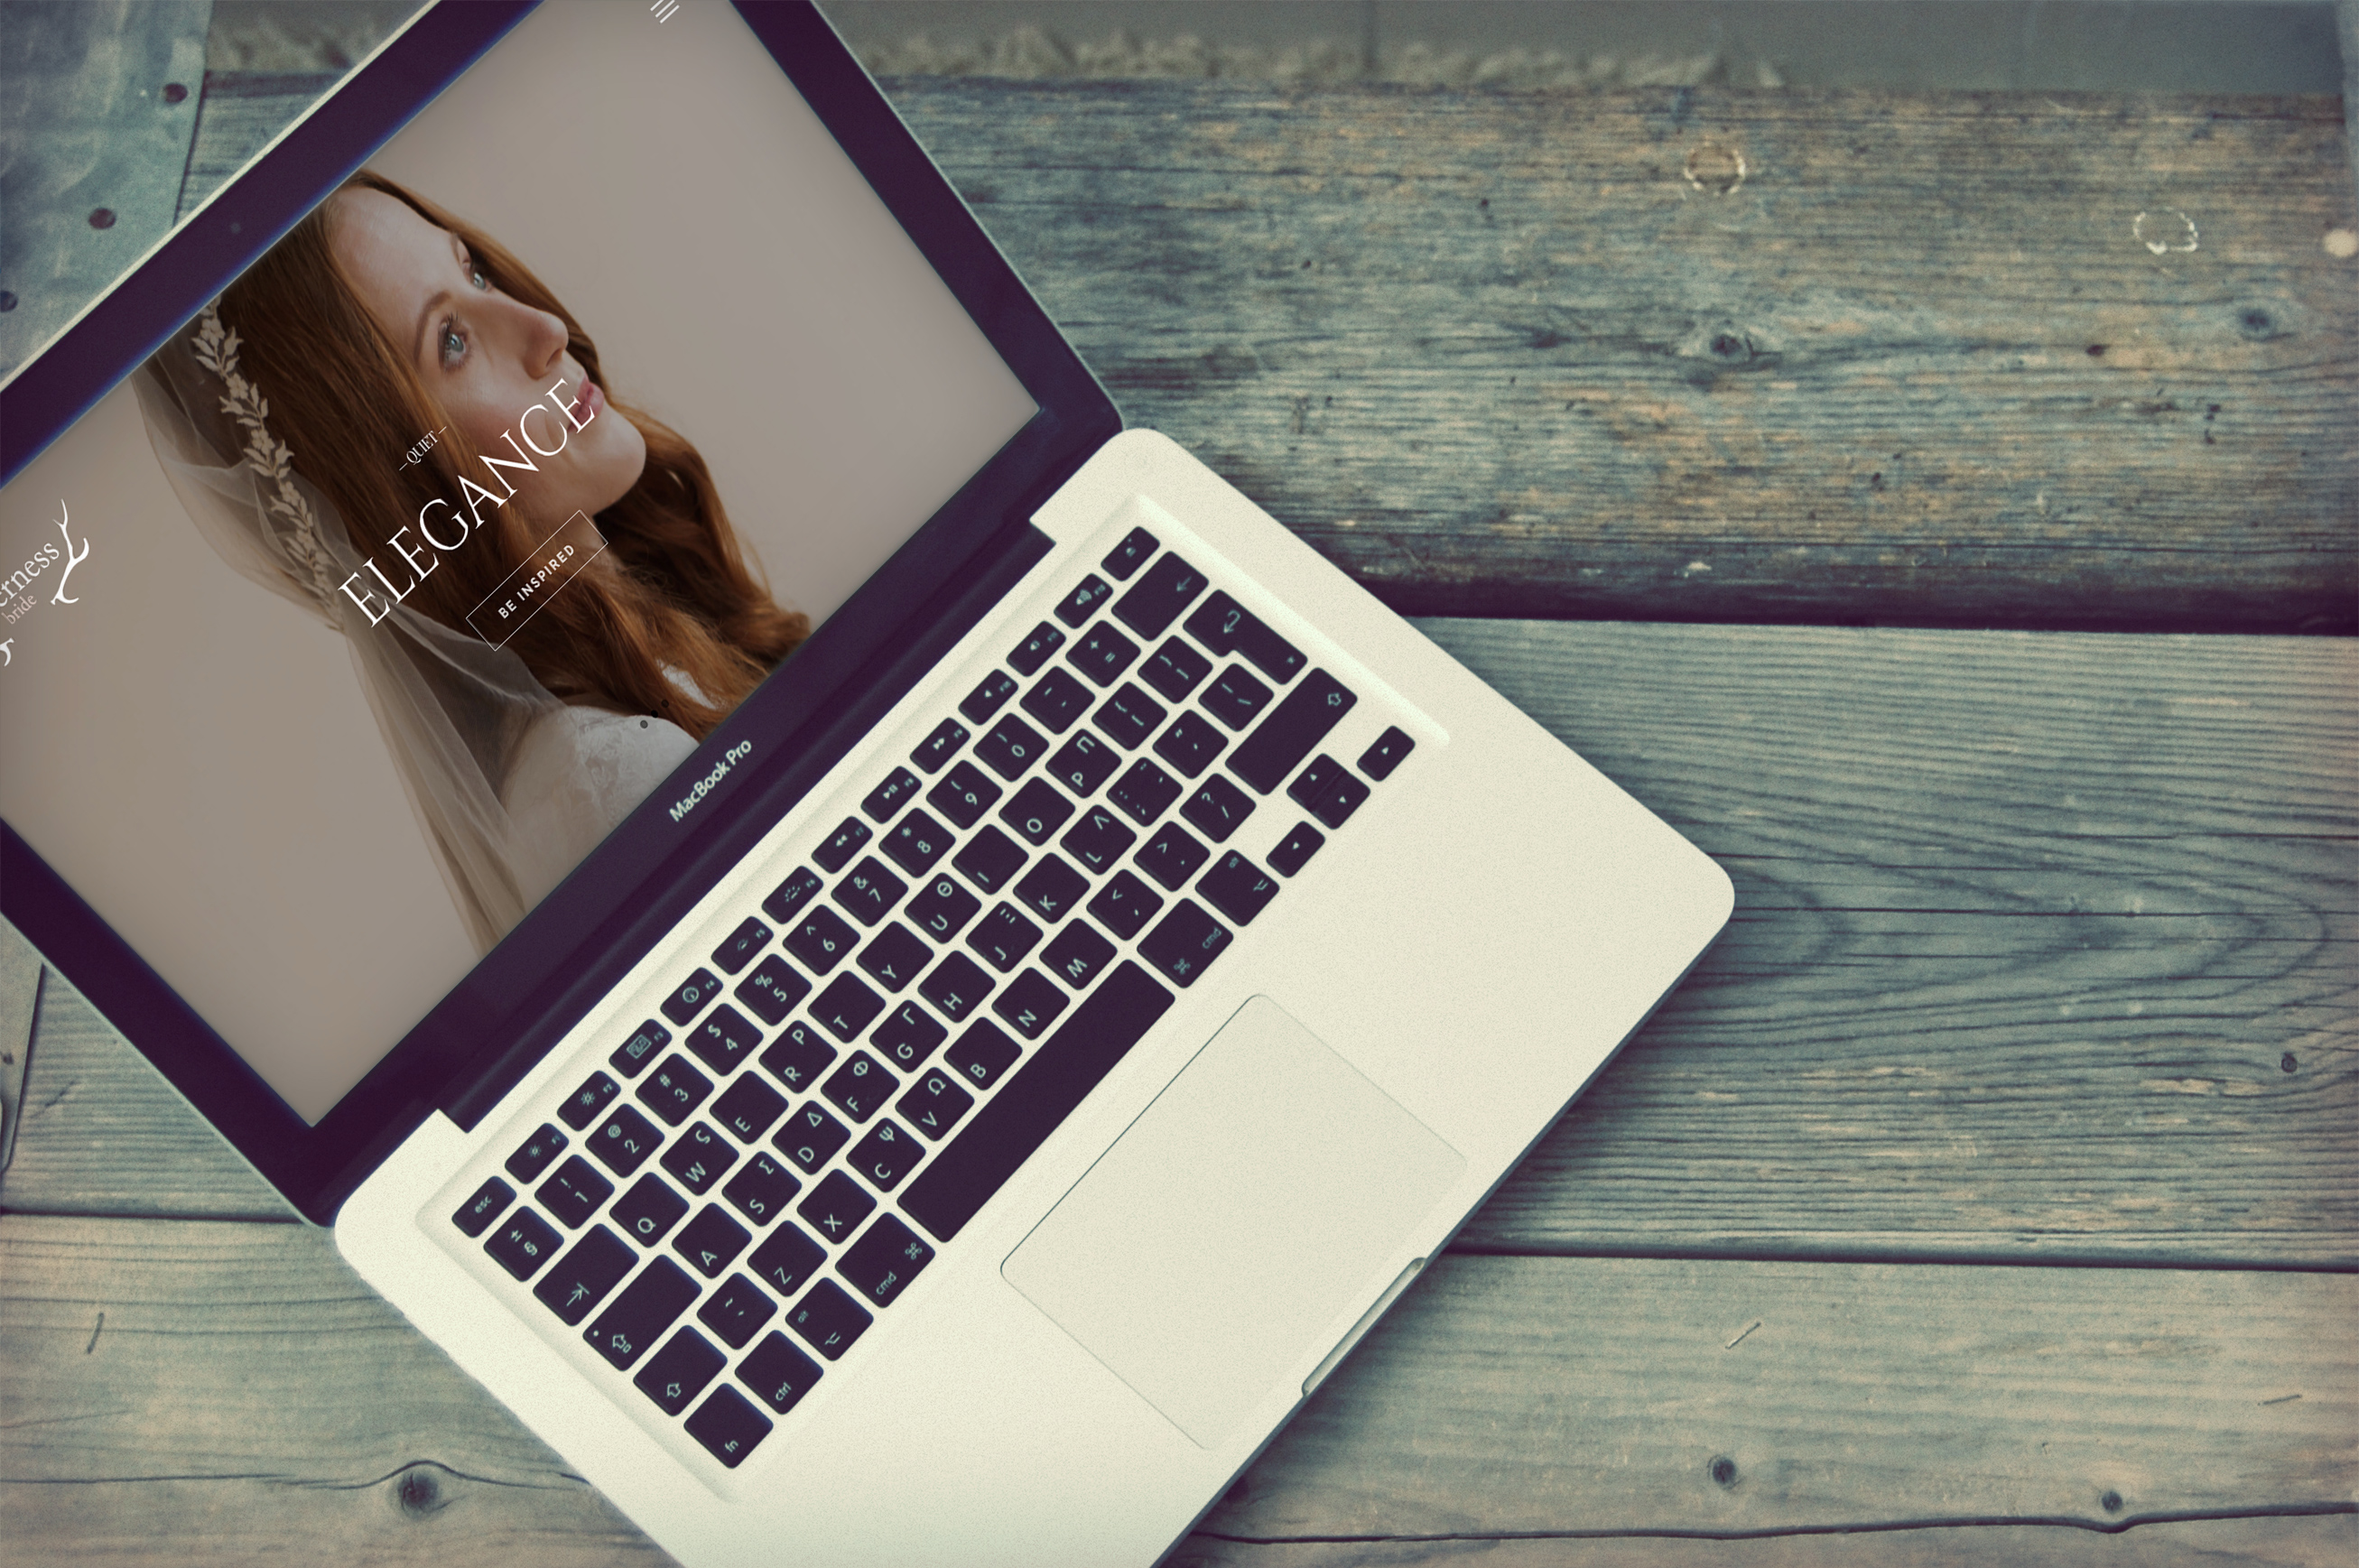 Web design for Wilderness Bride, Knutsford